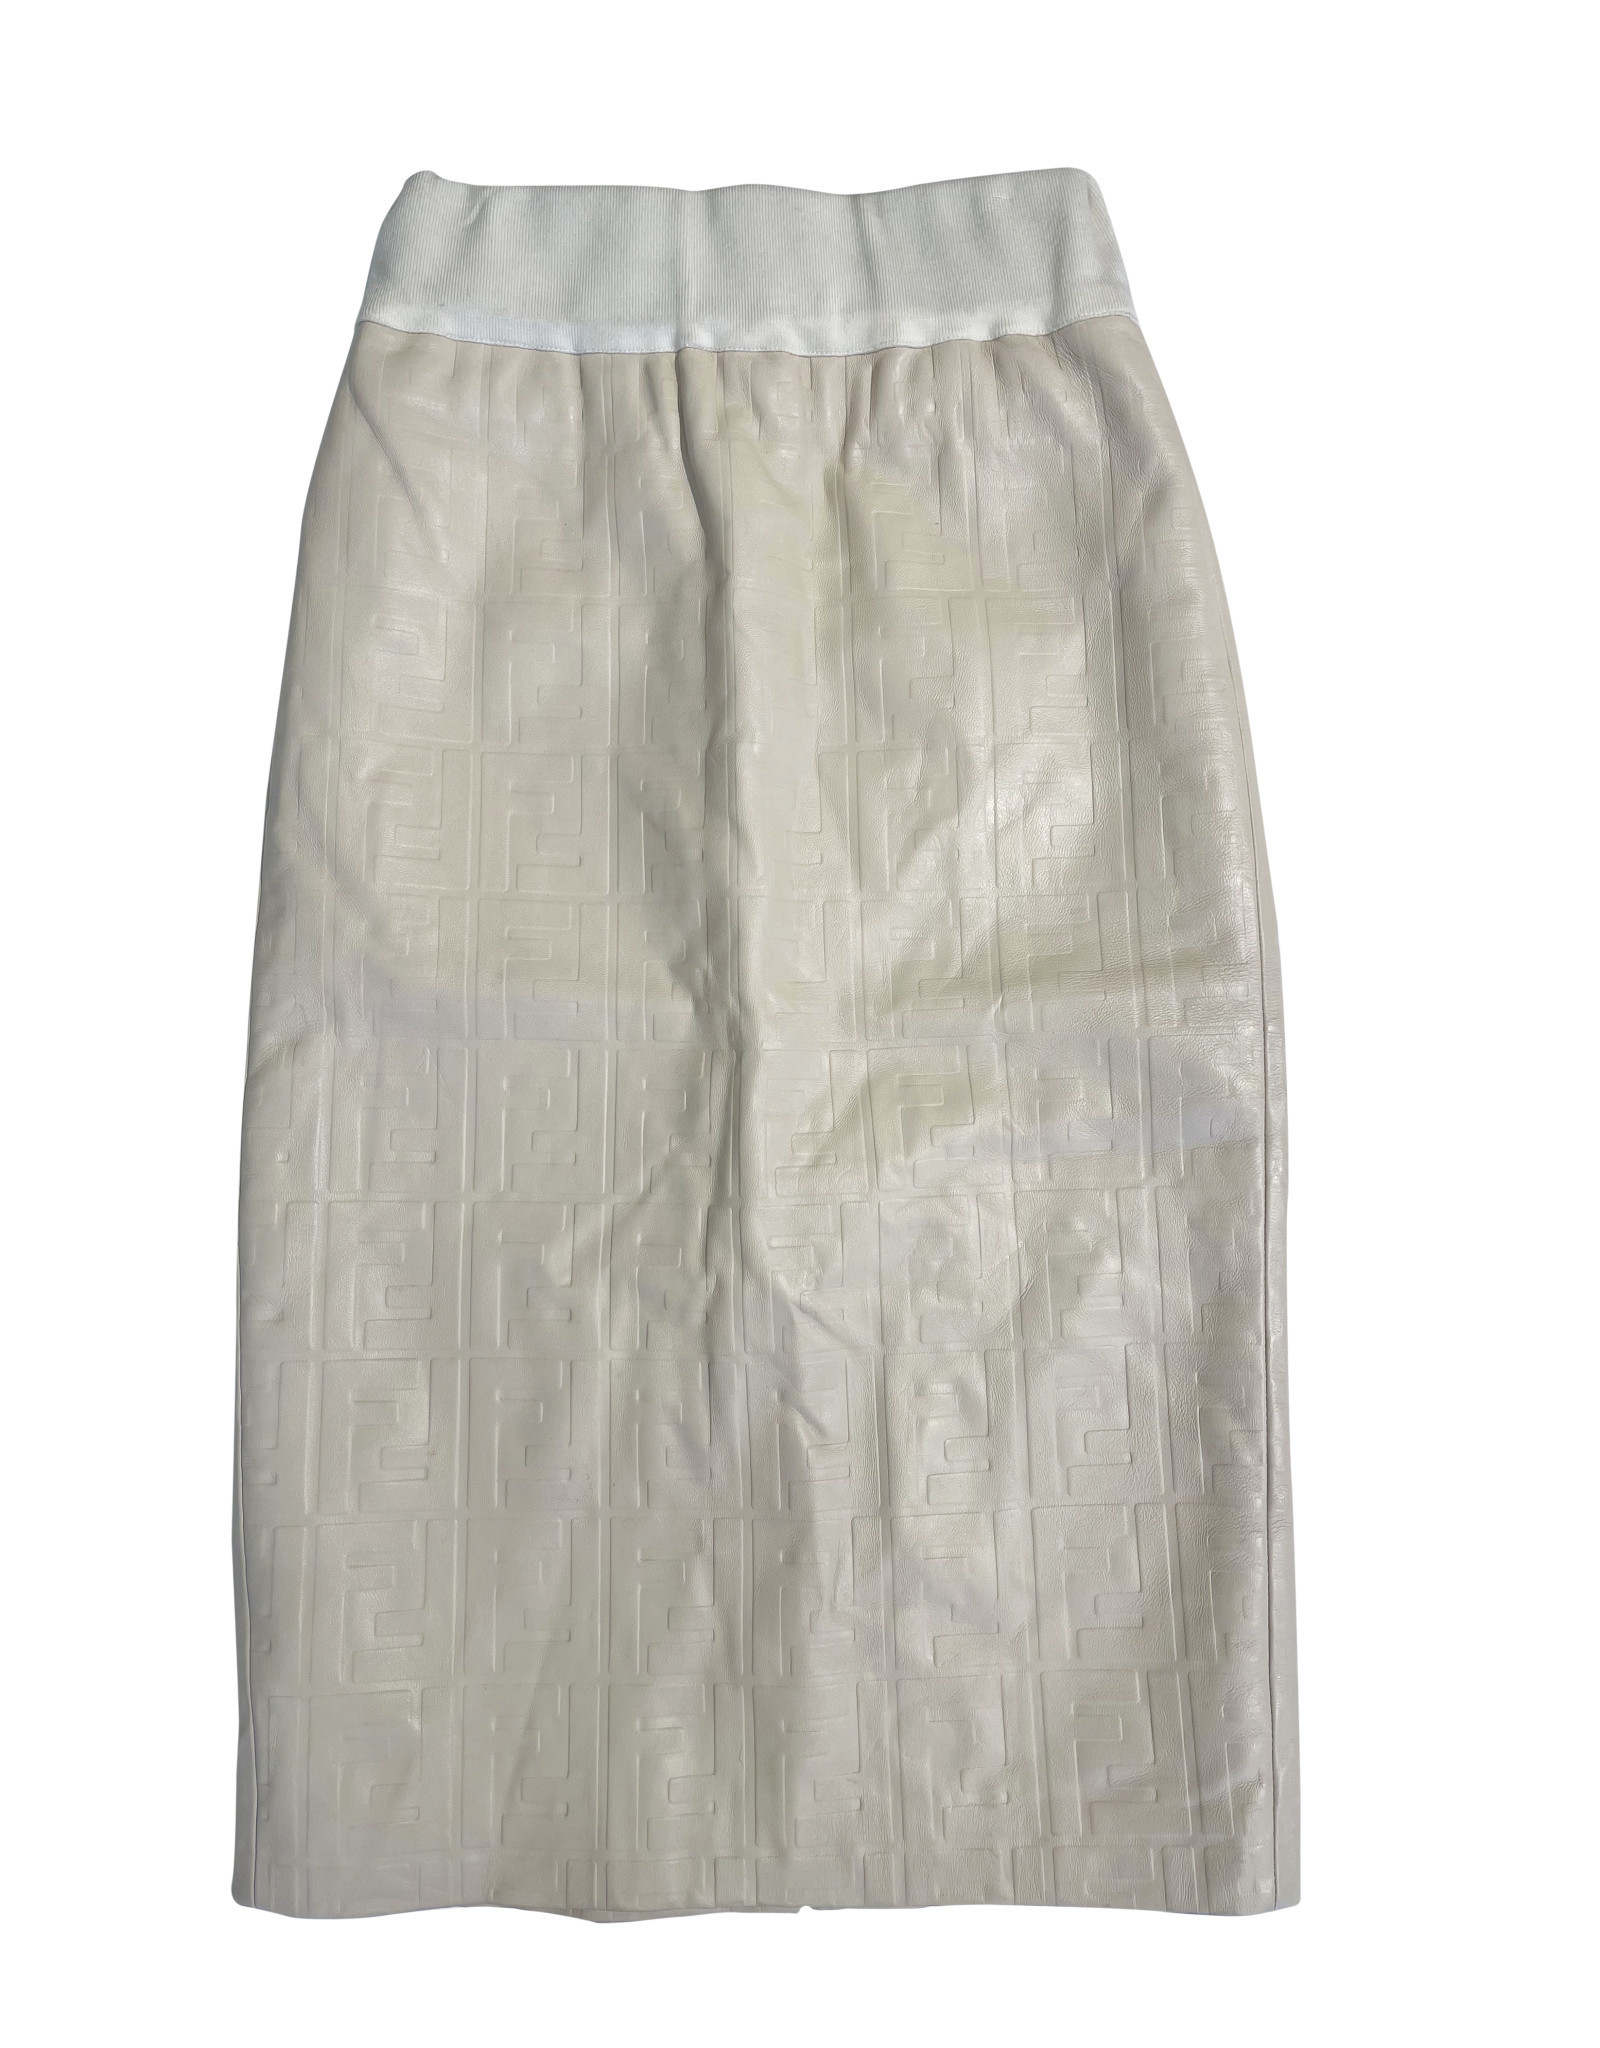 Wyld Blue Long Fendi Leather Skirt Cream